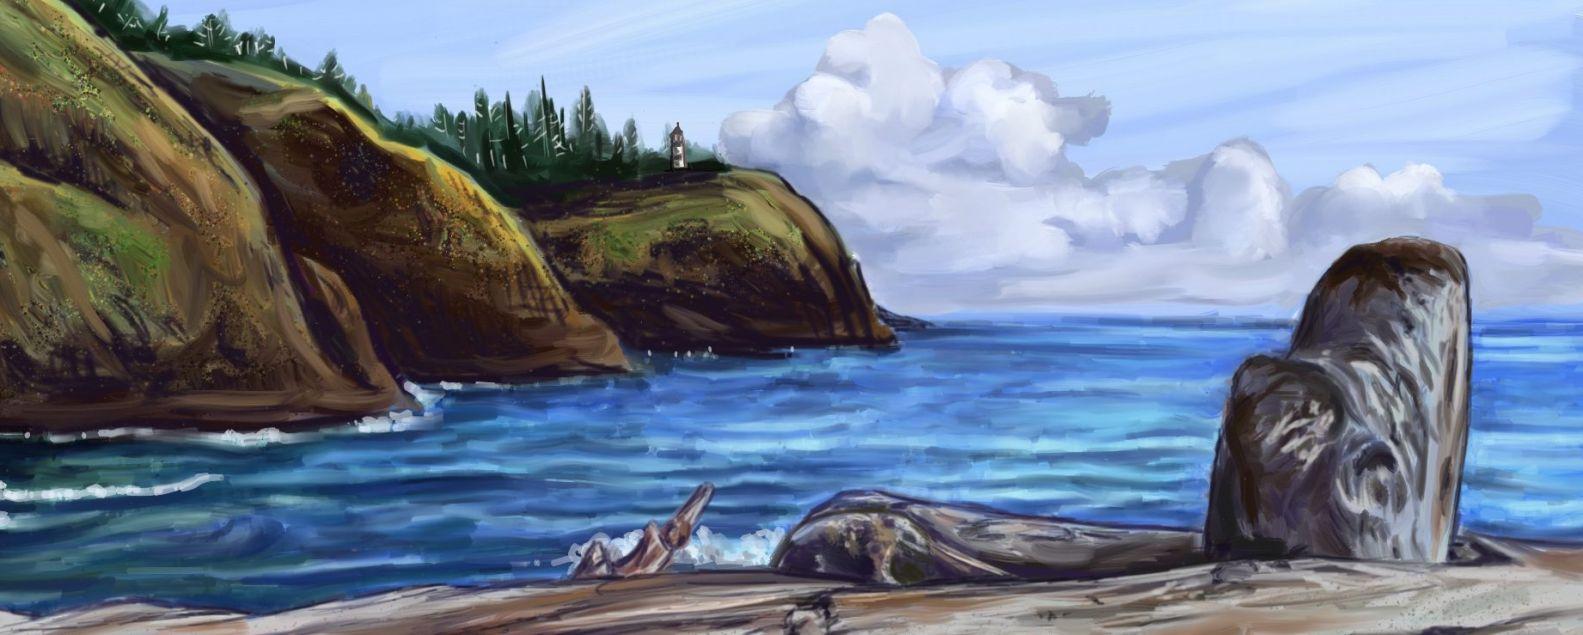 Ocean-Wallpaper